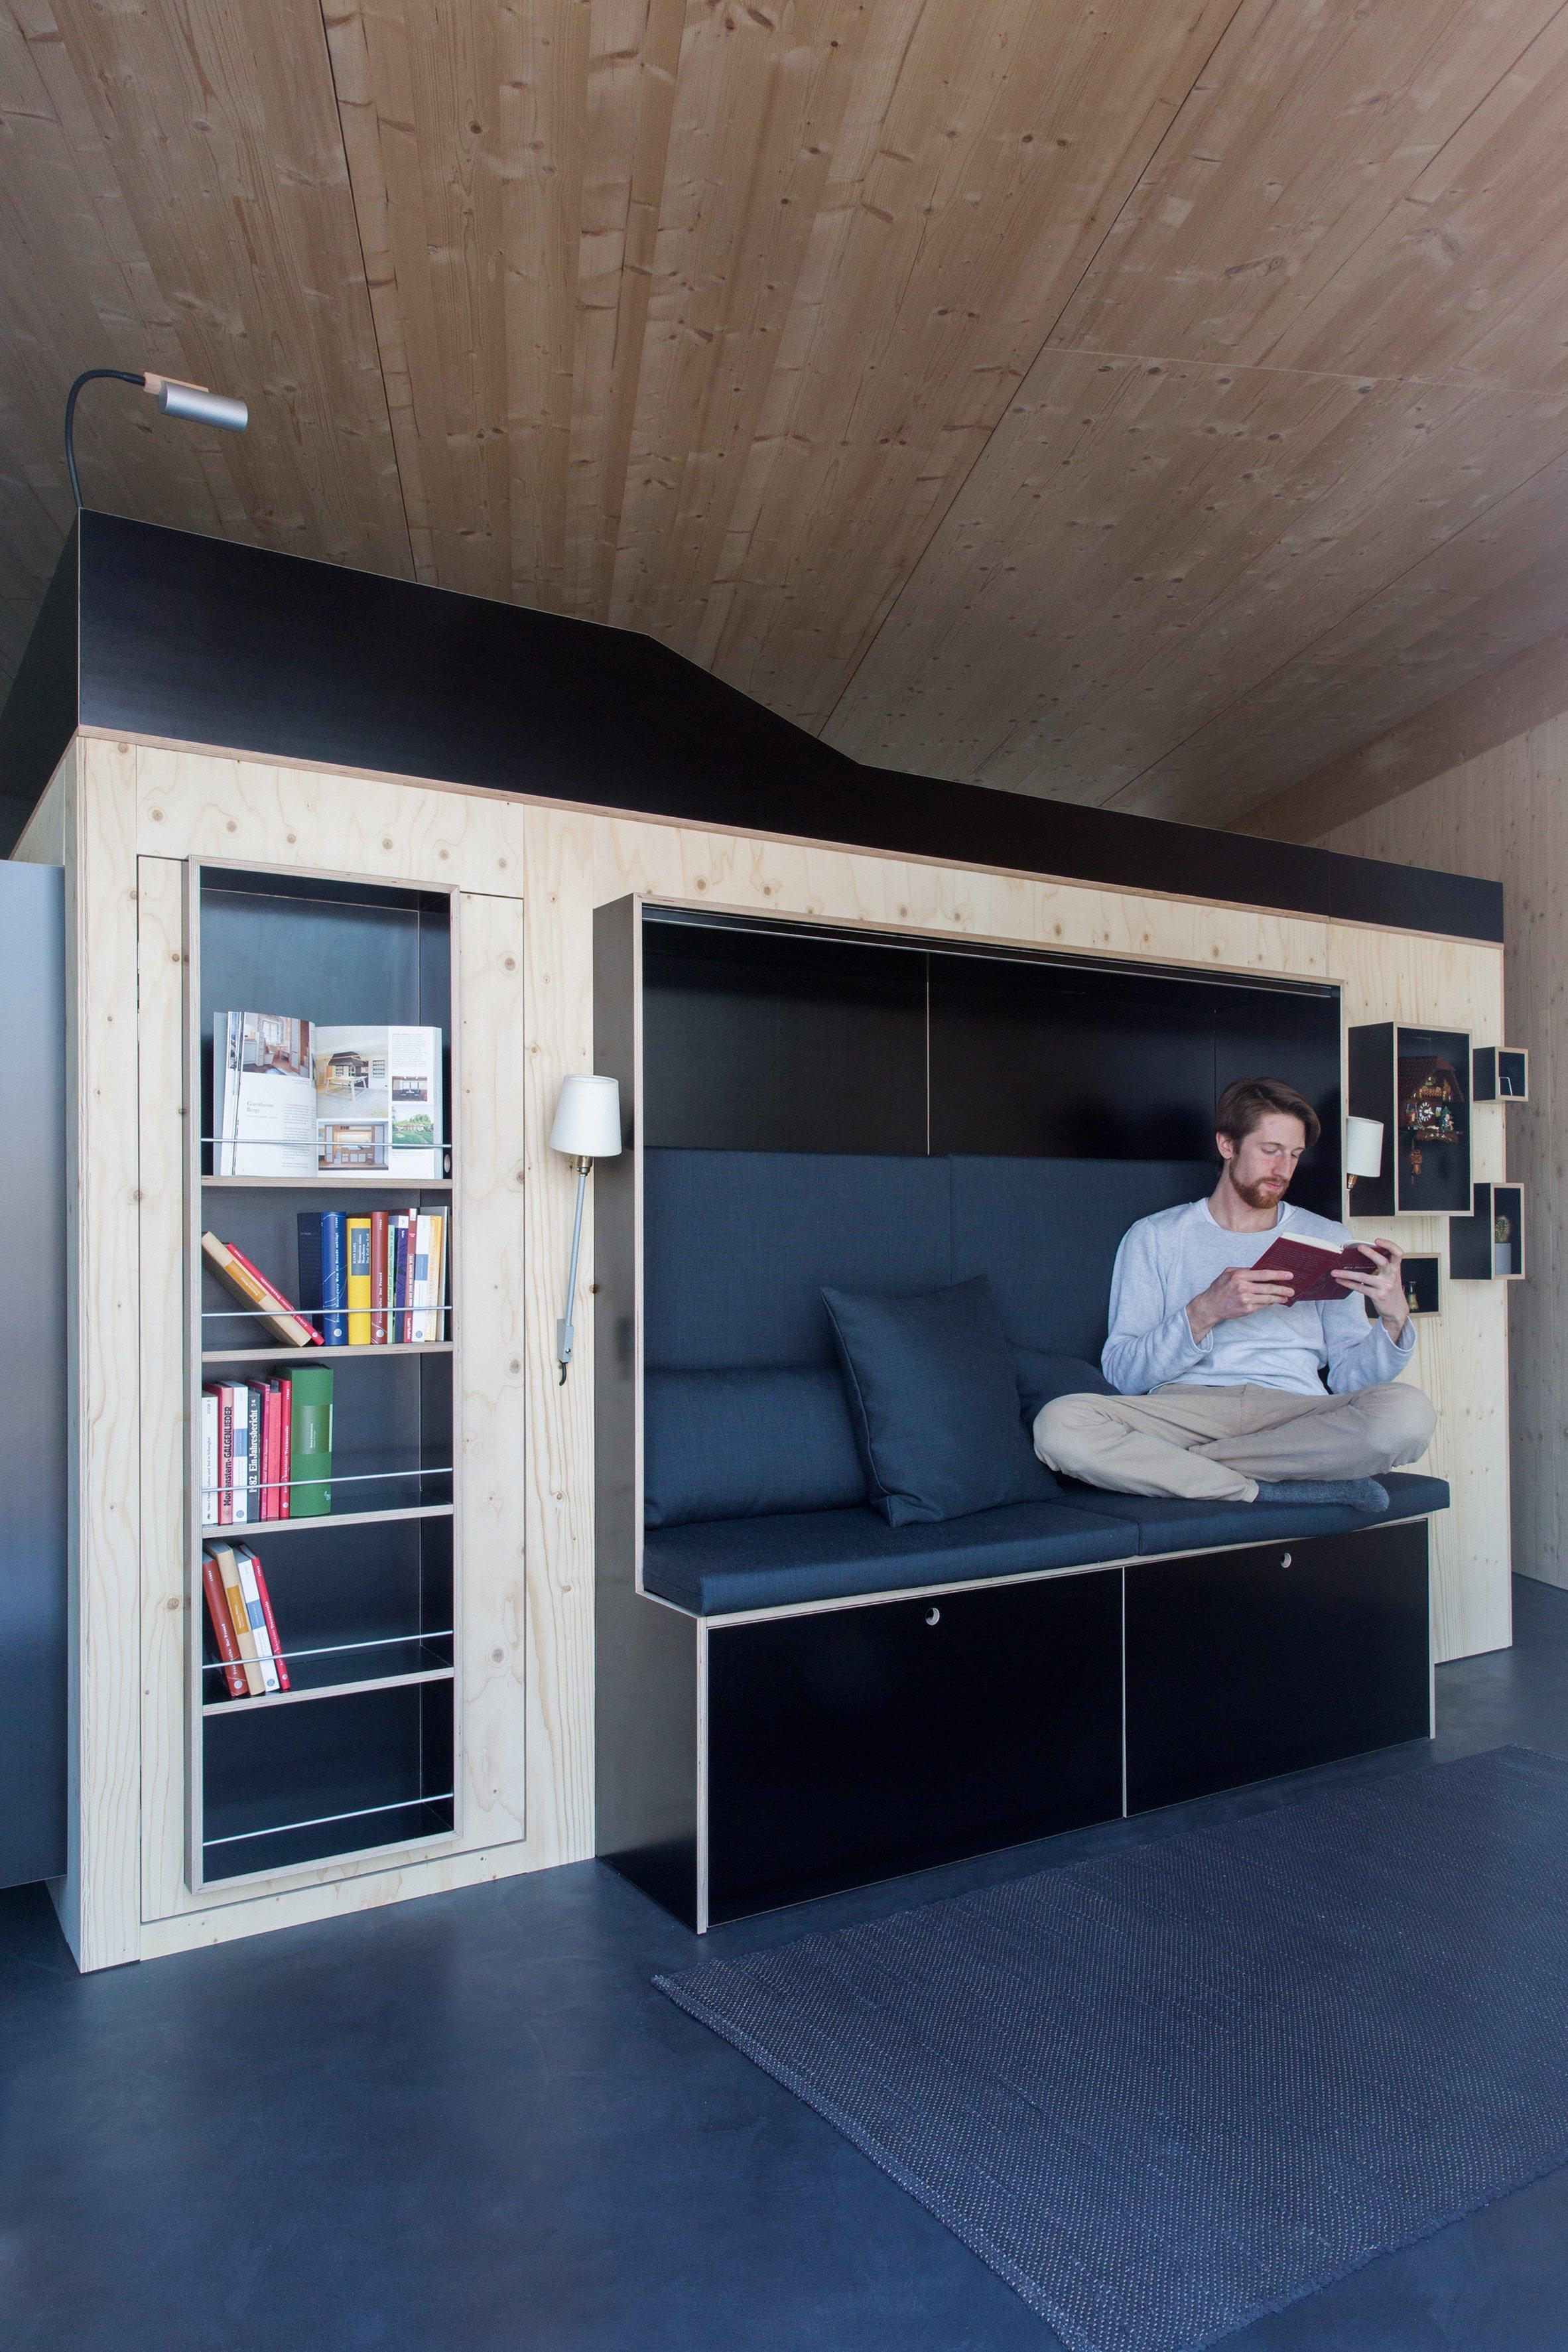 Kammerspiel - Nils Holger Moormann - Germany - Interior 2 - Humble Homes